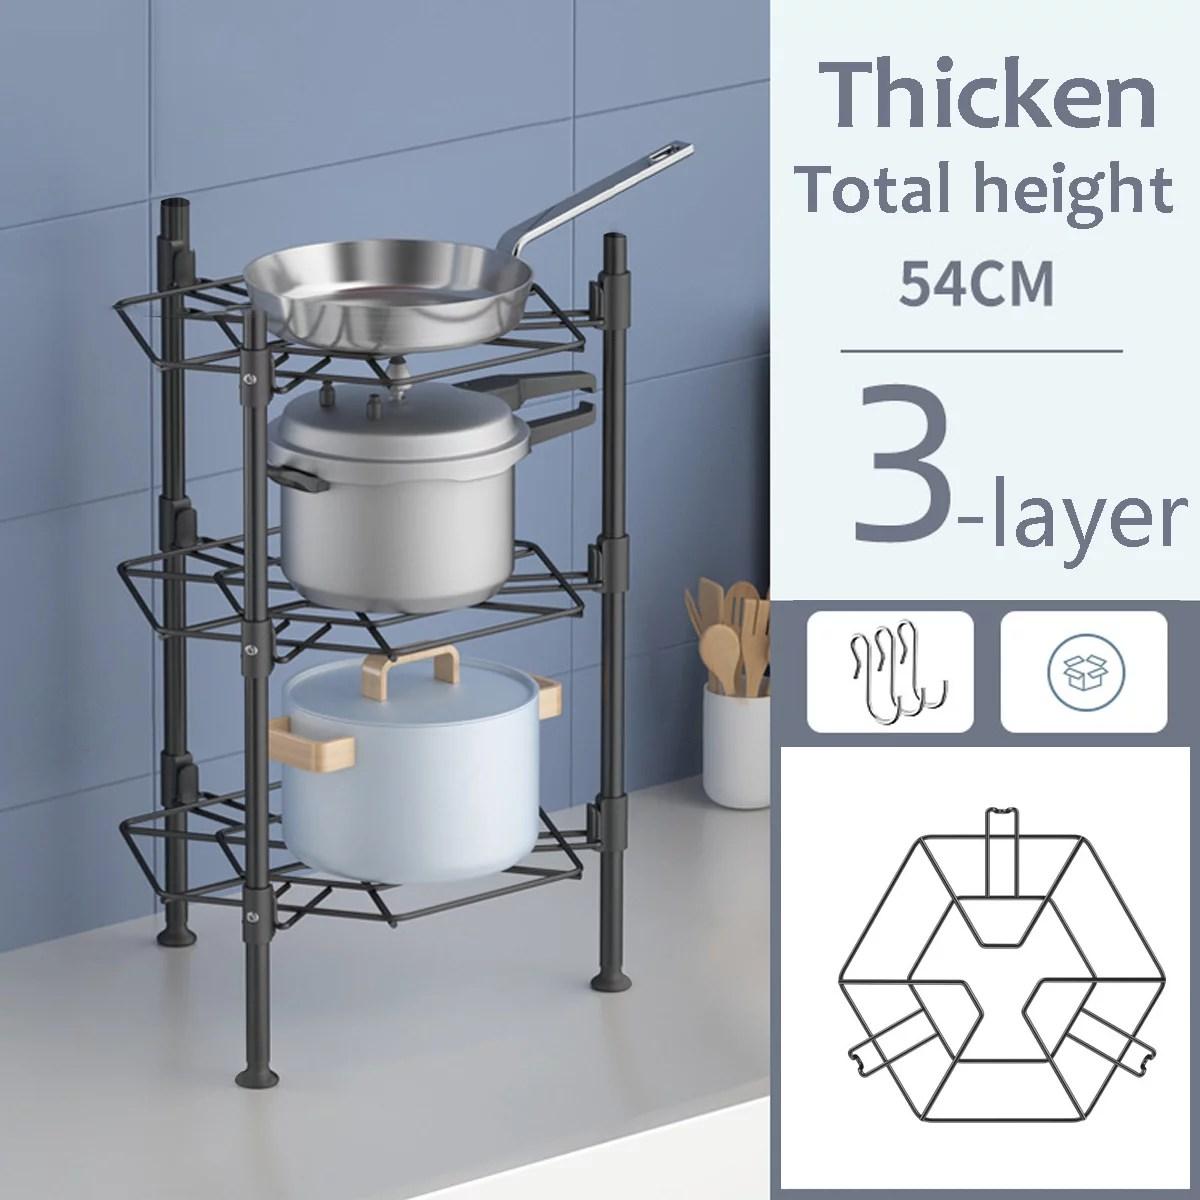 3 4 5 tiers kitchen pot and pan rack kitchen rack storage shelf stainless steel pan stand pot holder bathroom storage rack